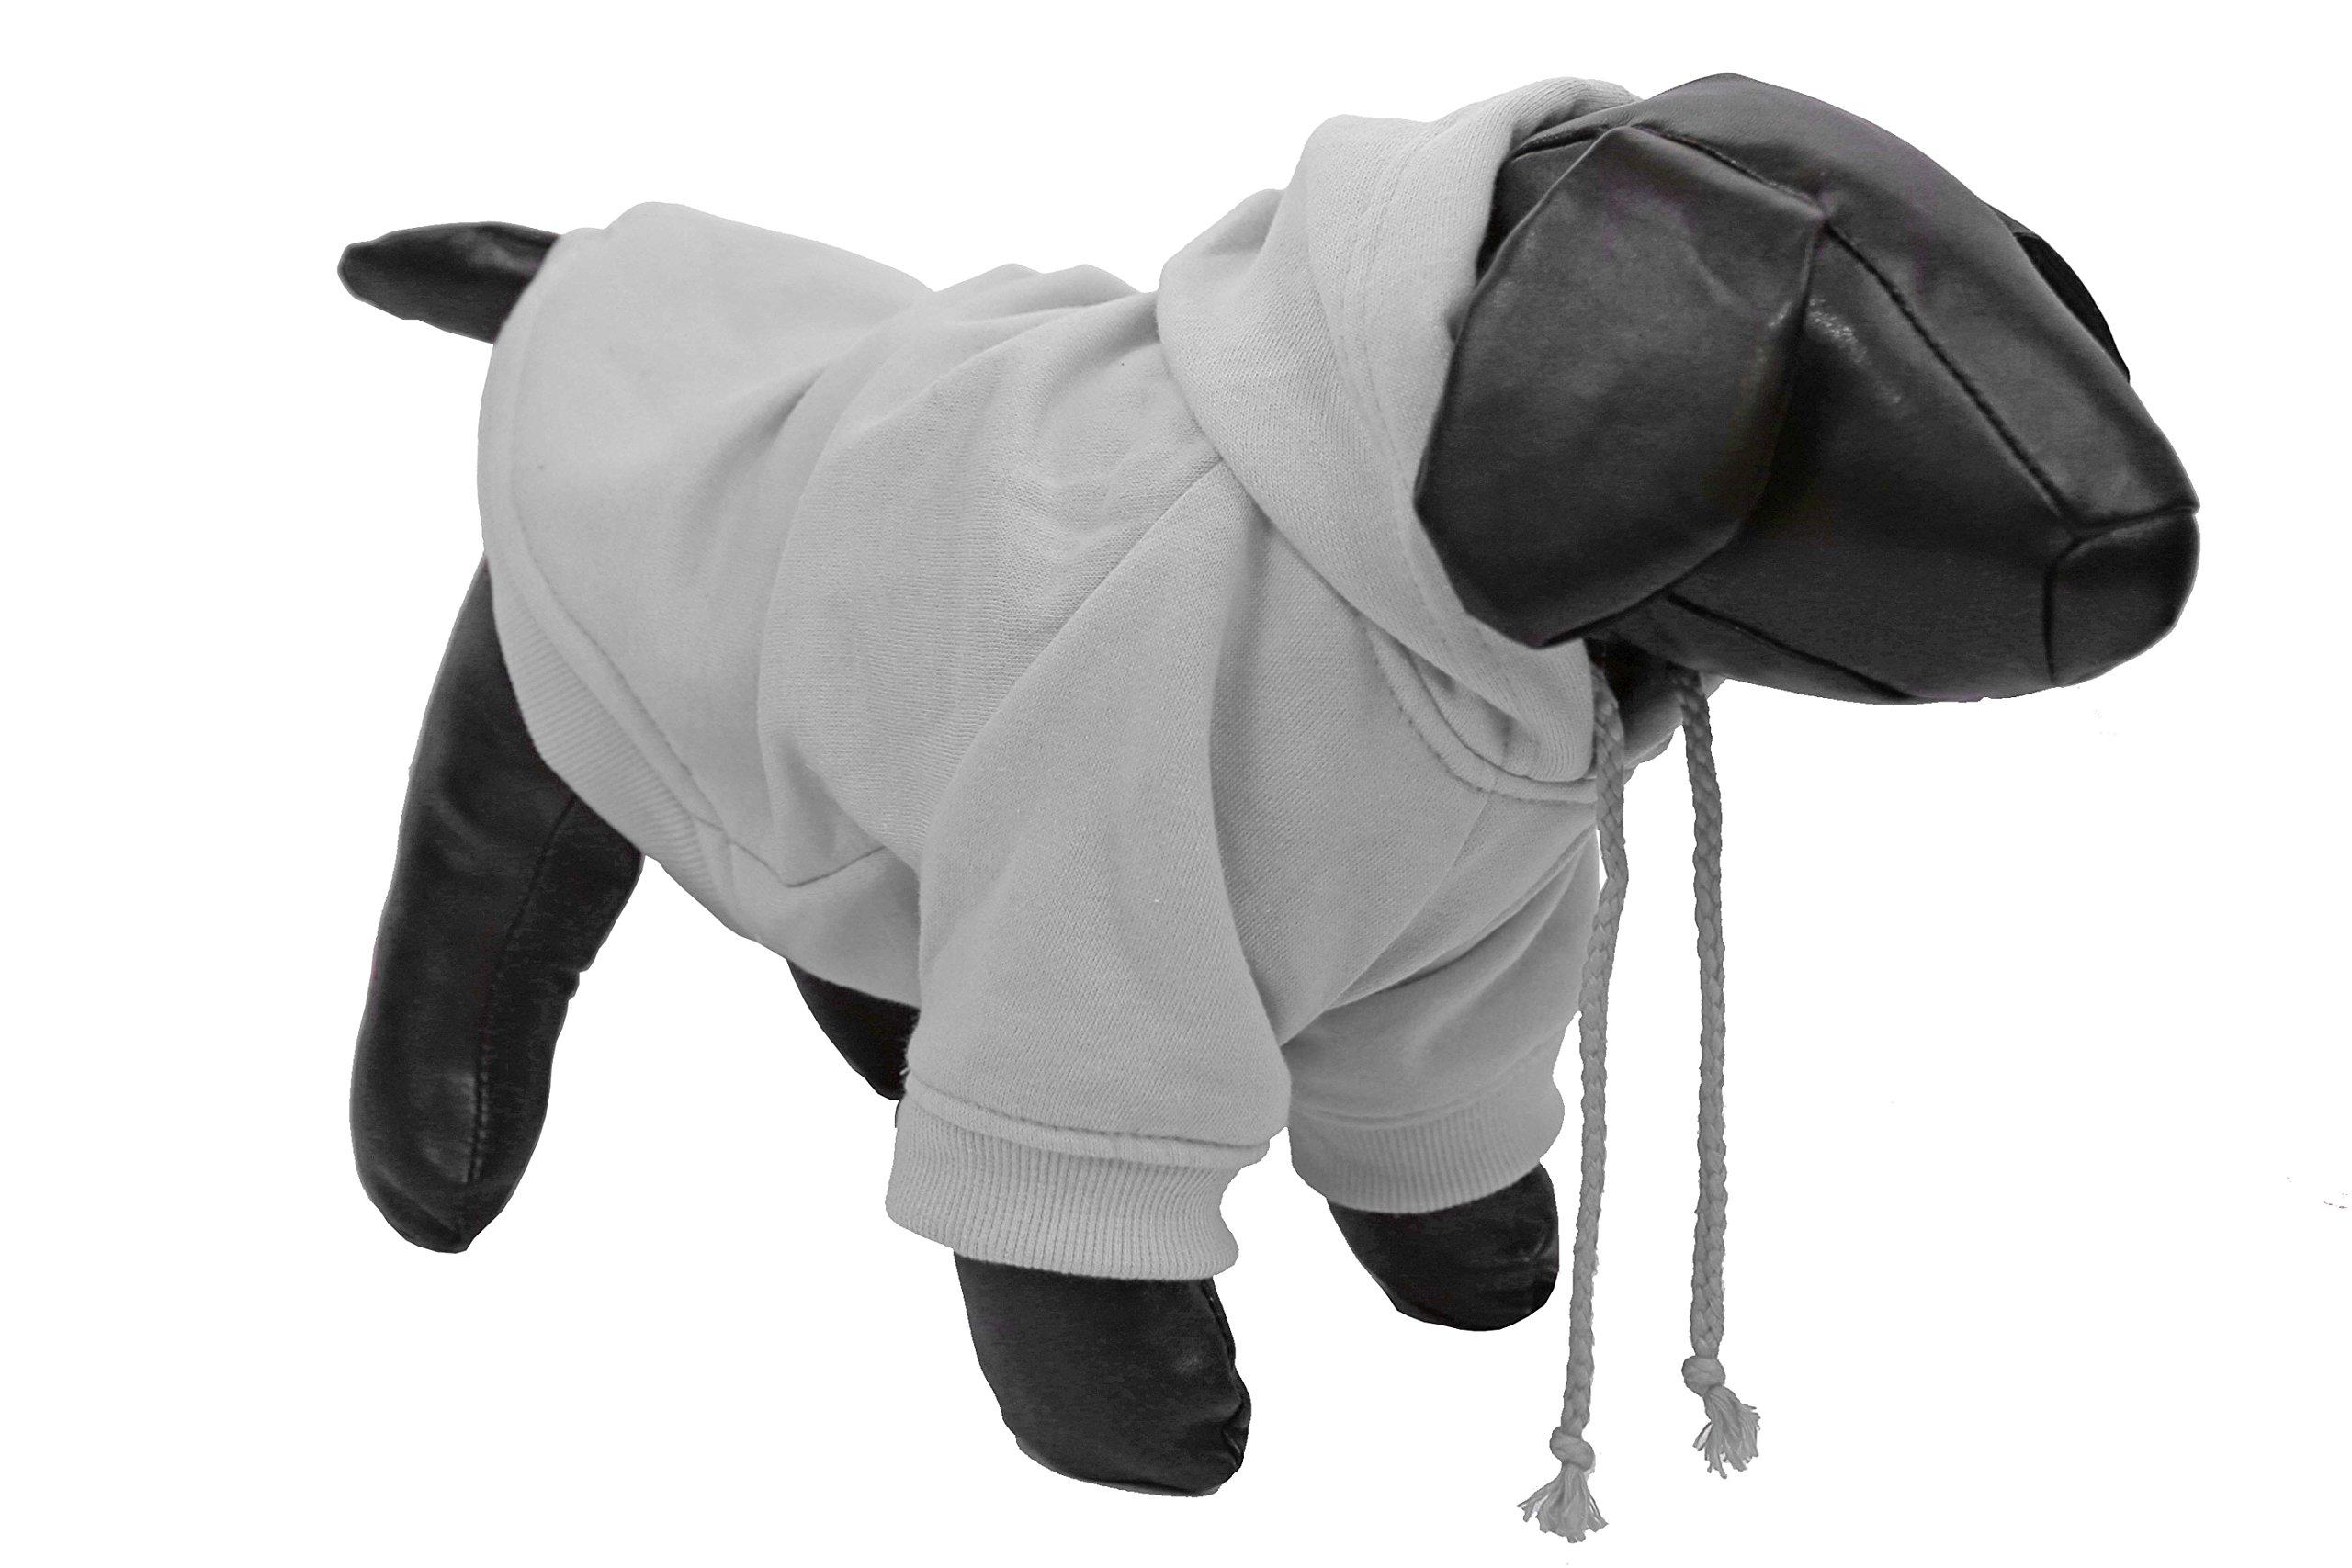 Pet Life American Classic' Designer Fashion Plush Cotton Pet Dog Hooded Sweater Hoodie, Small, Grey